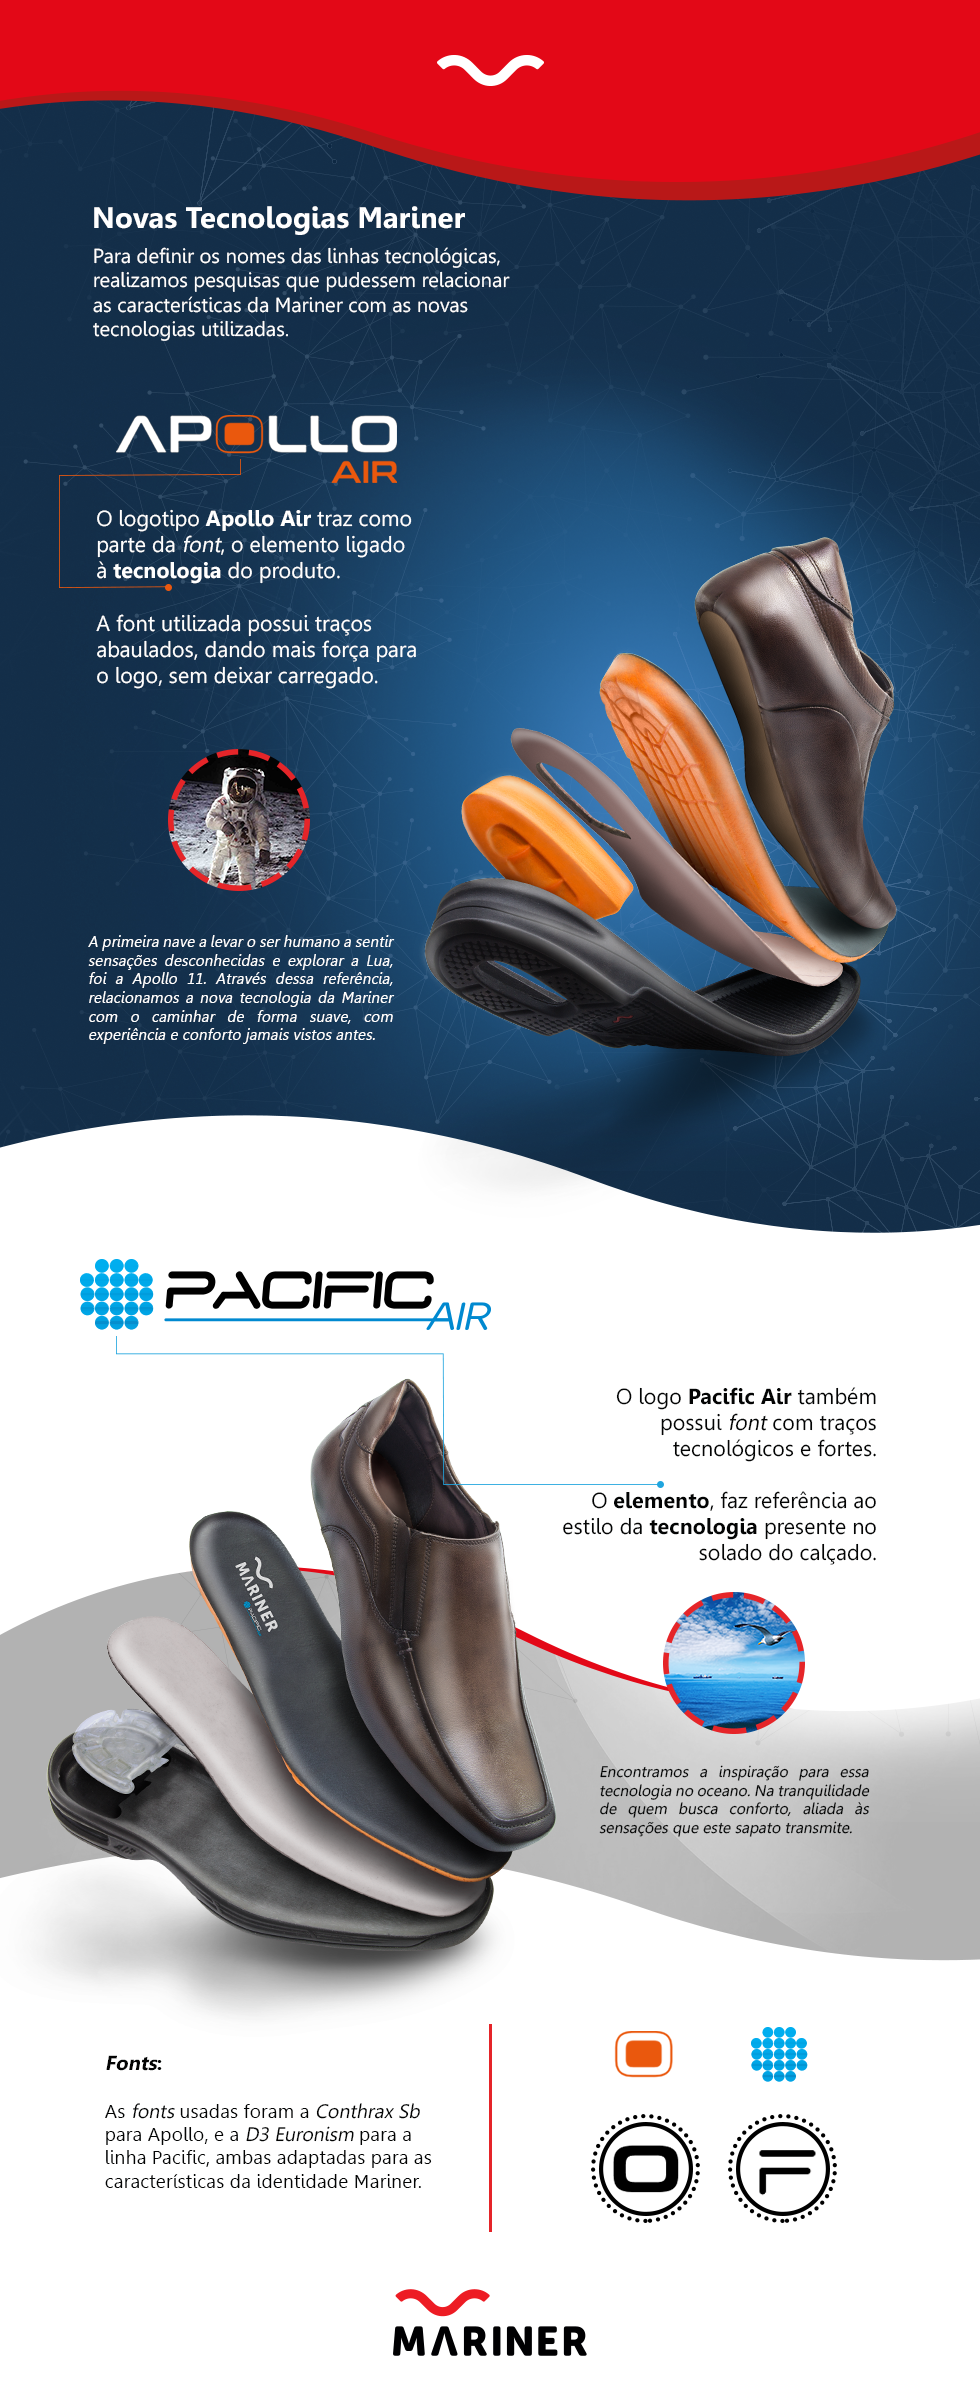 Projeto Novas Tecnologias Mariner